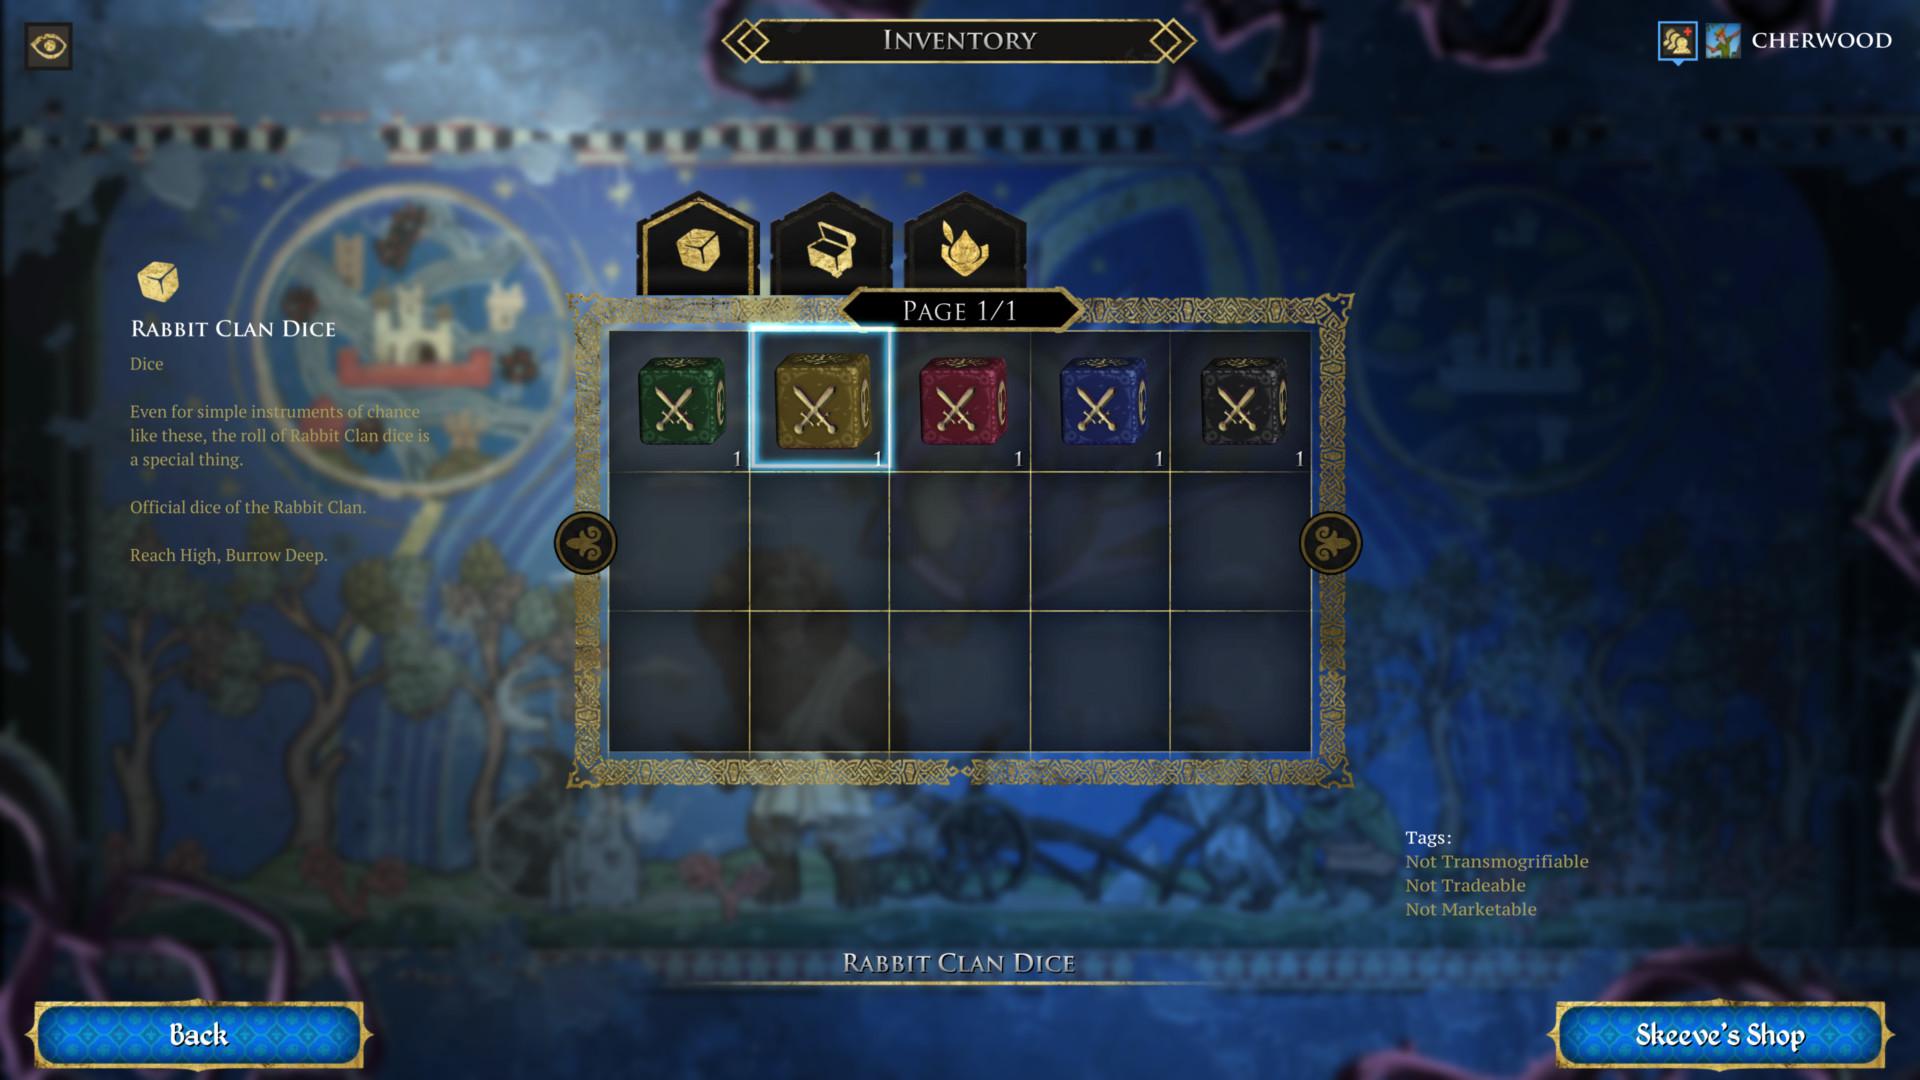 armello-dice-inventory